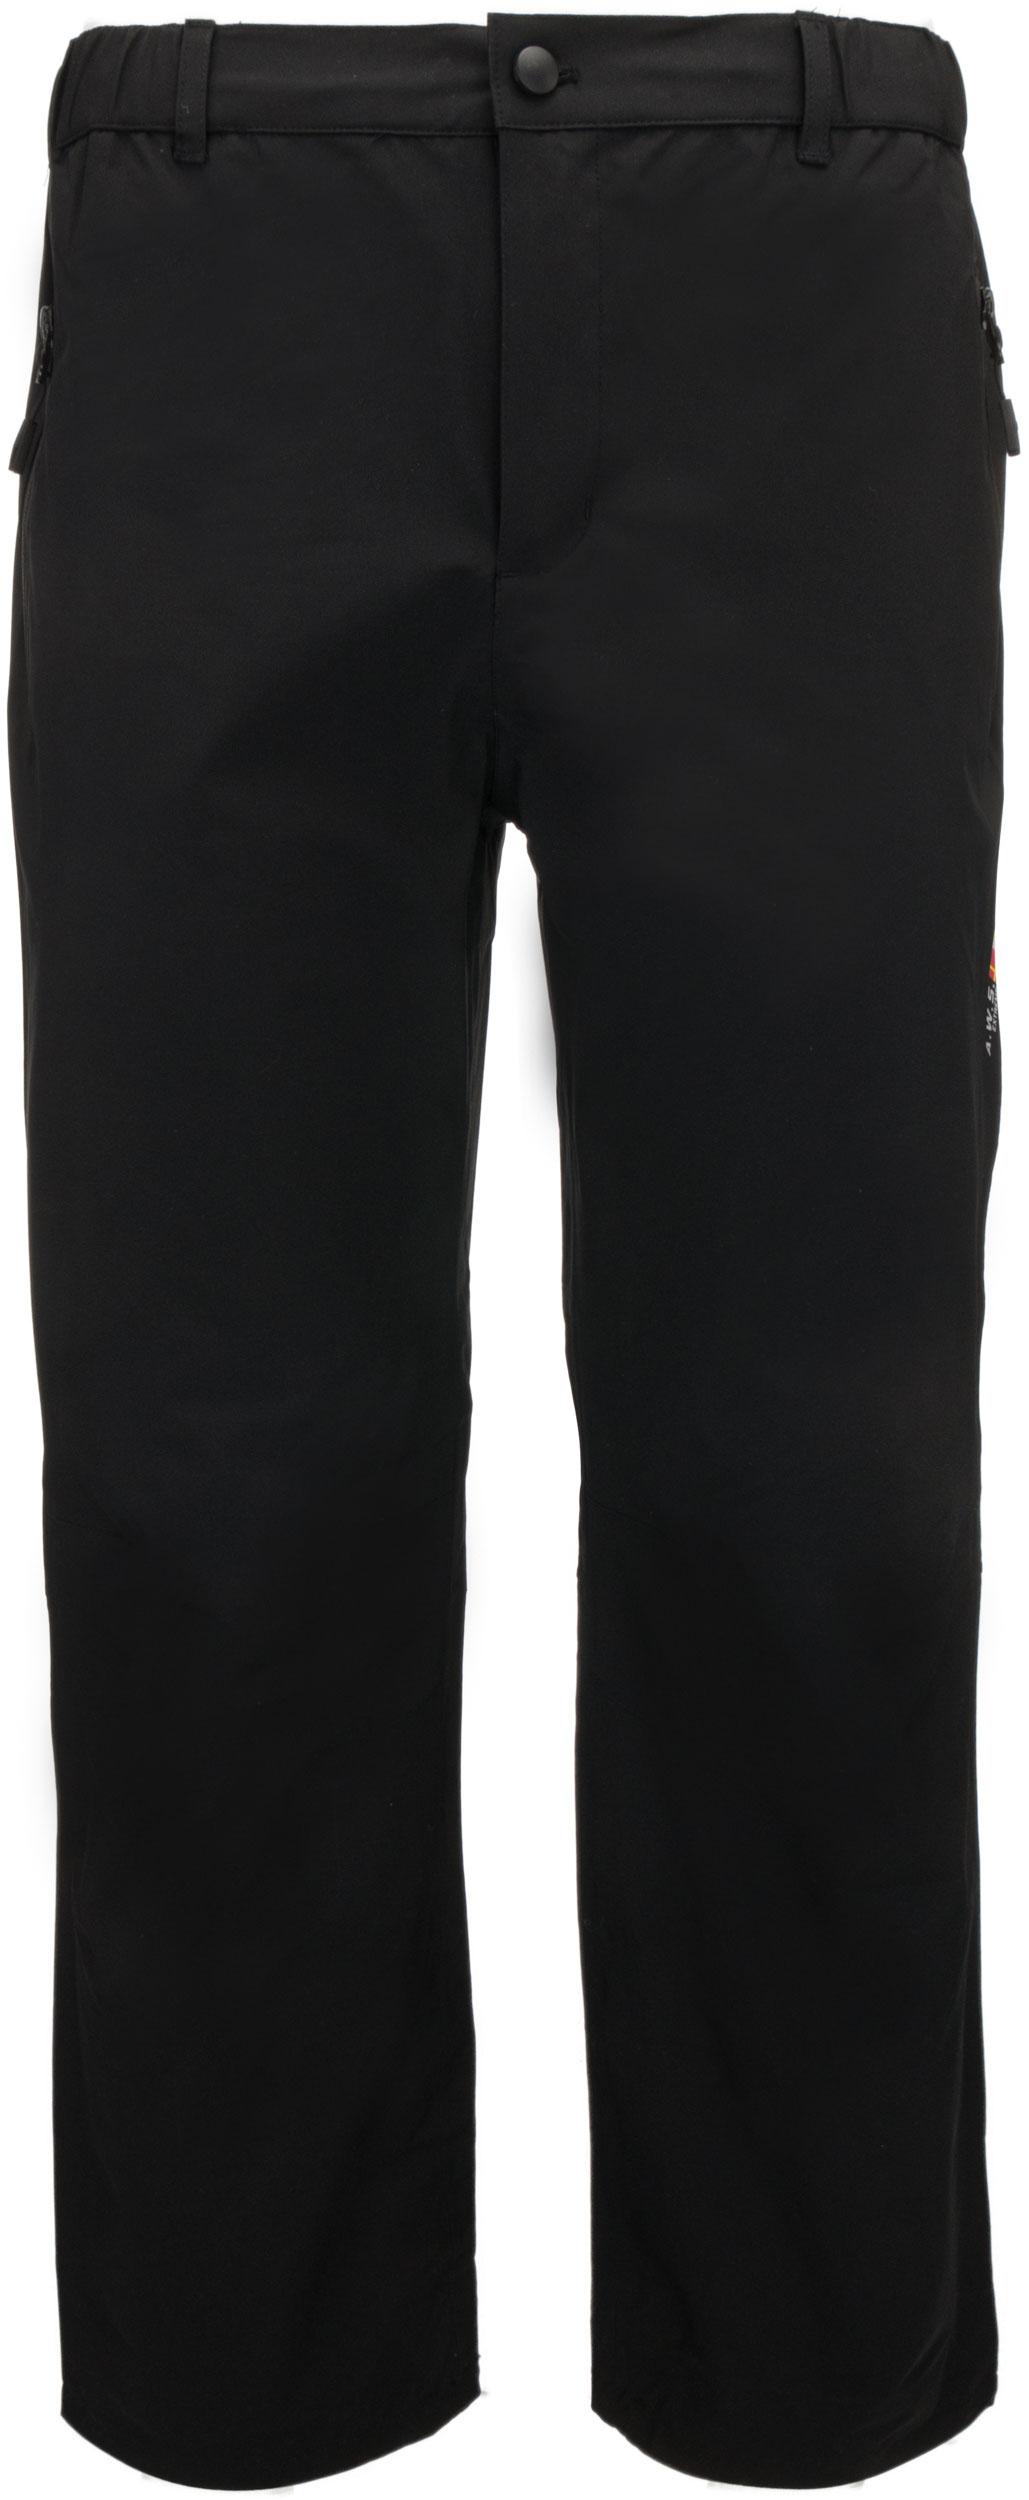 Pánské outdoorové kalhoty Rukka Raul